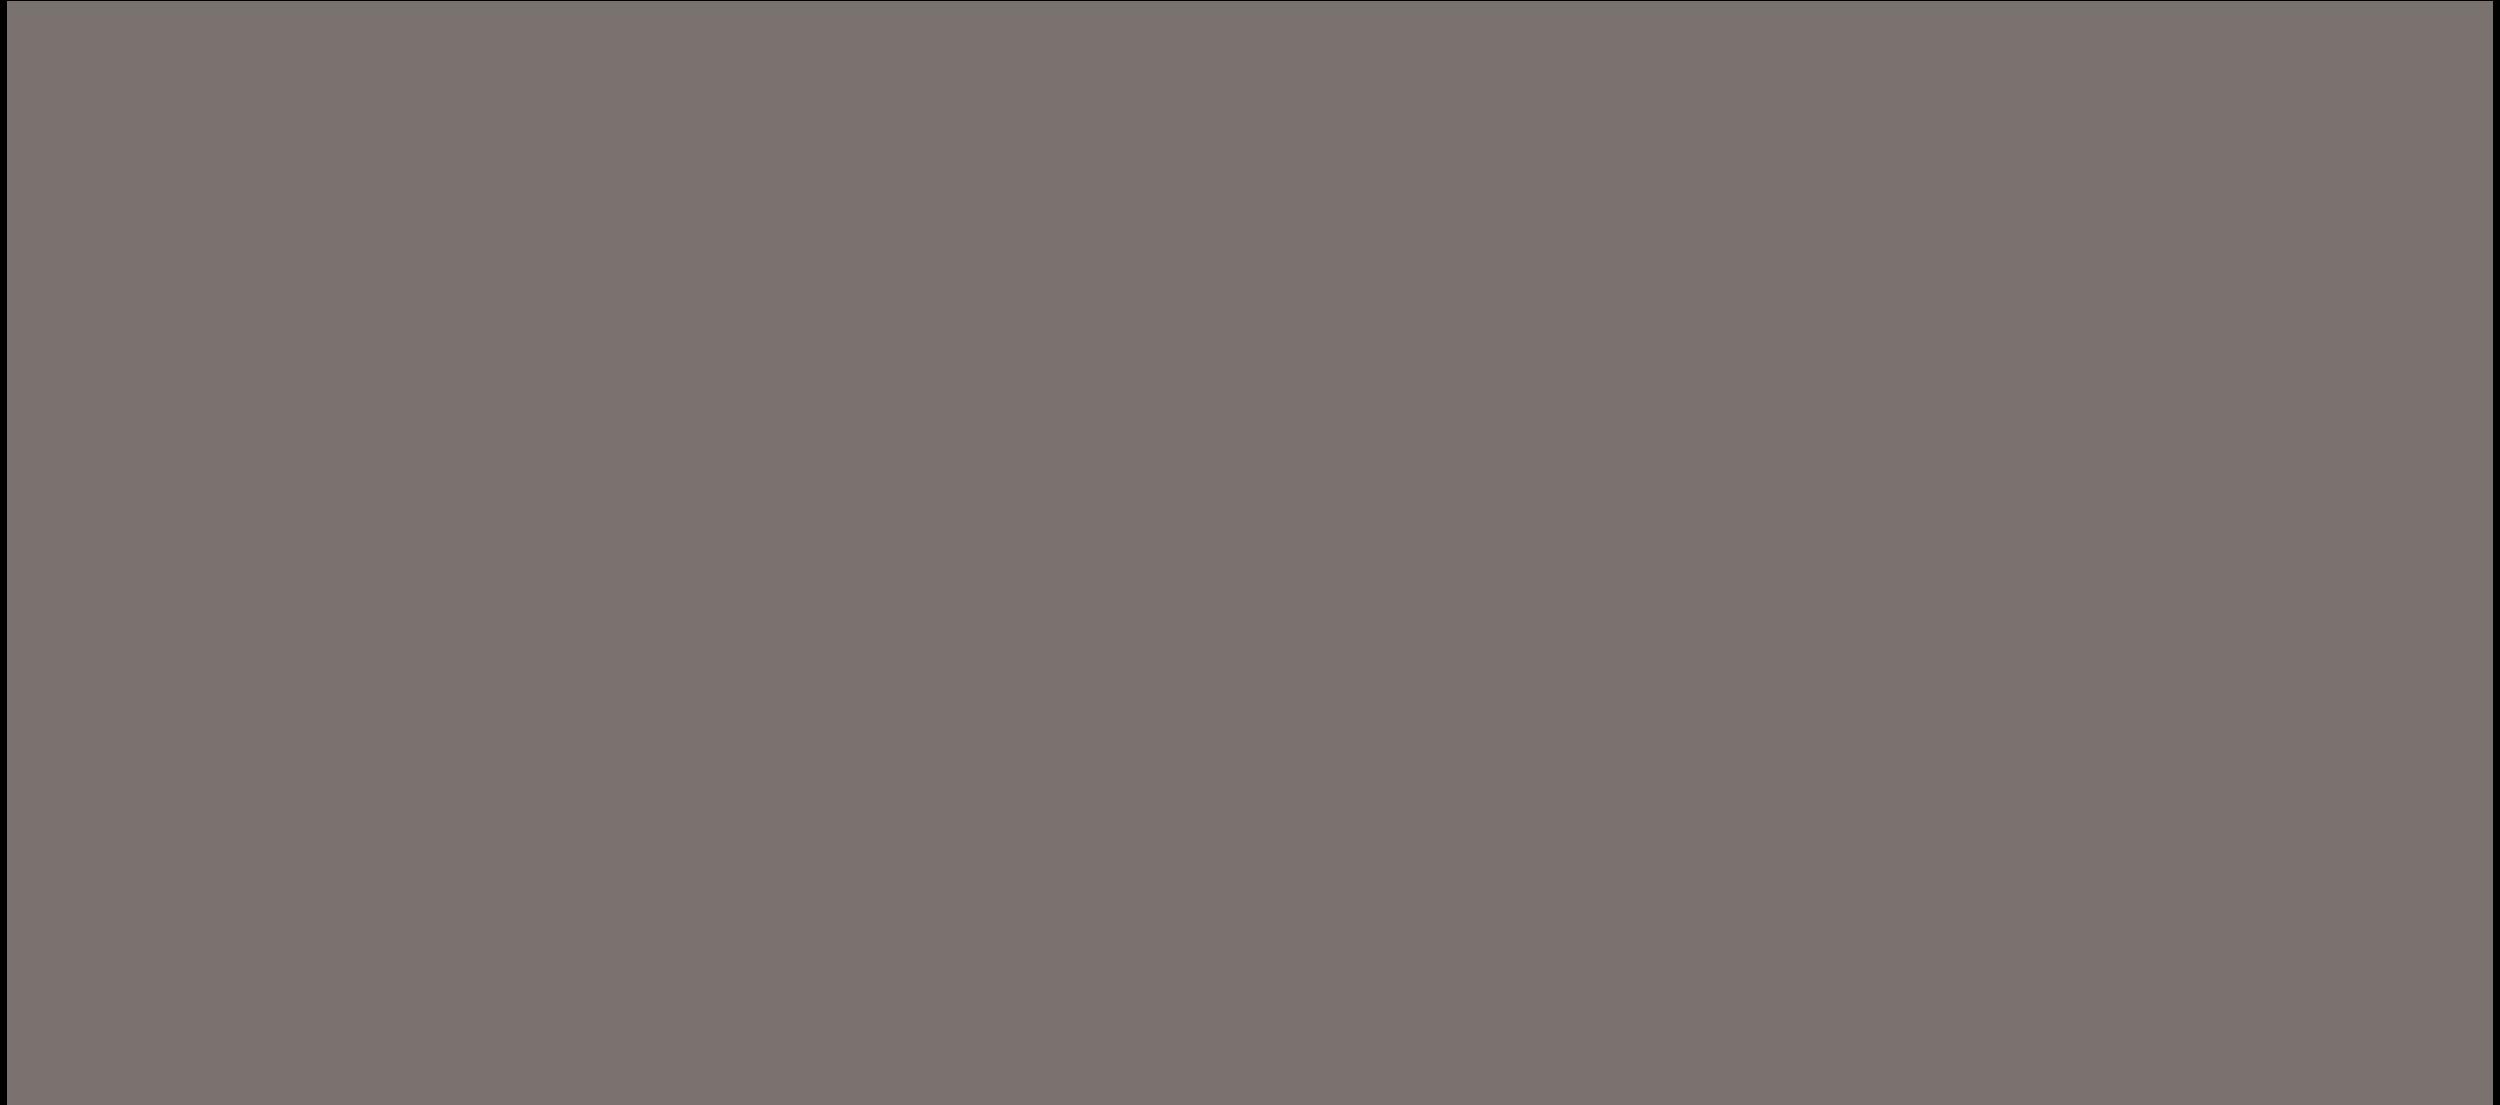 Naturally San Diego